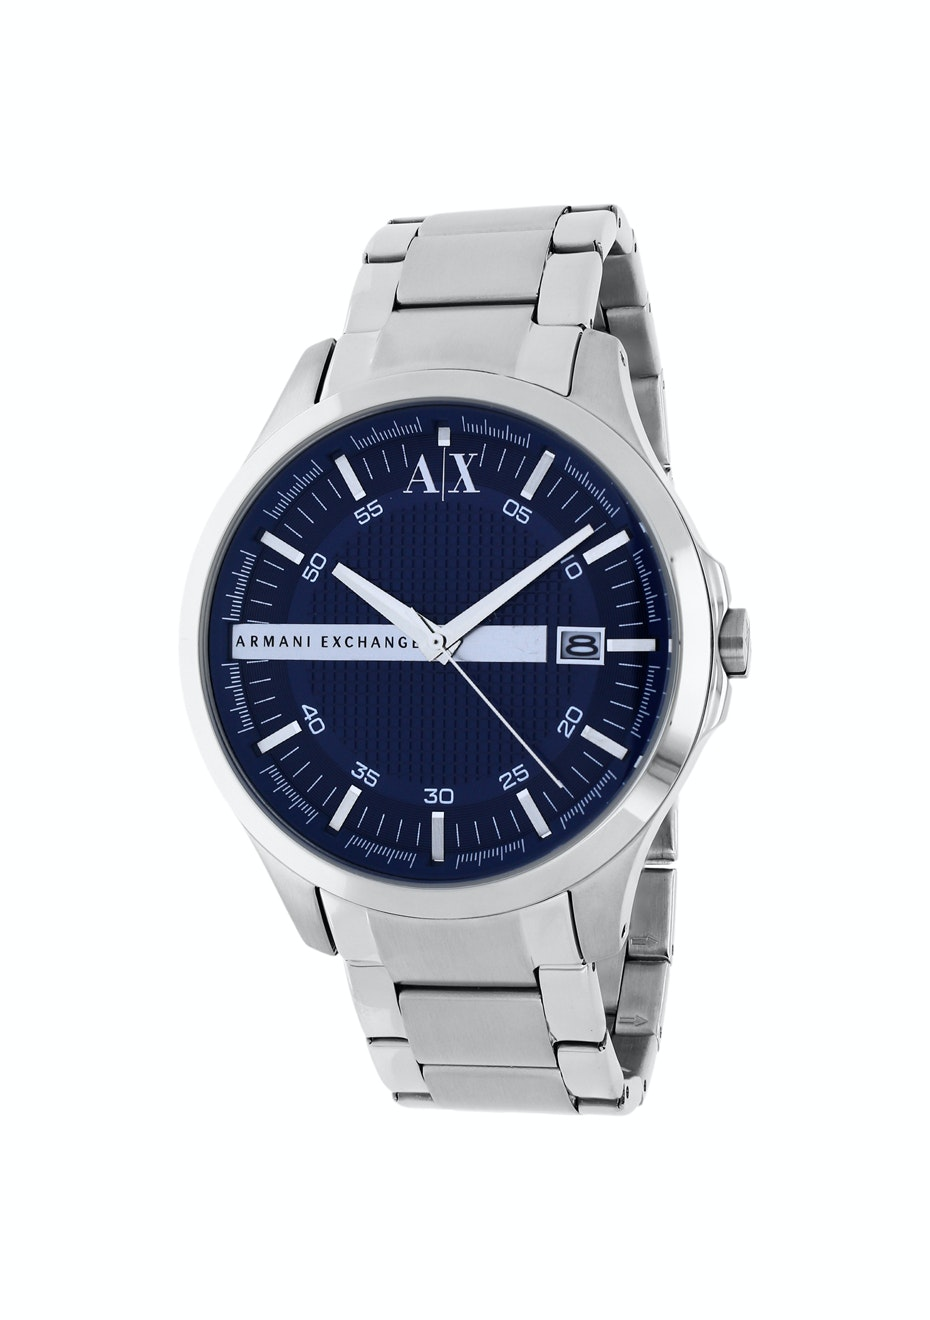 Armani Exchange Men's Classic - Blue/Silver